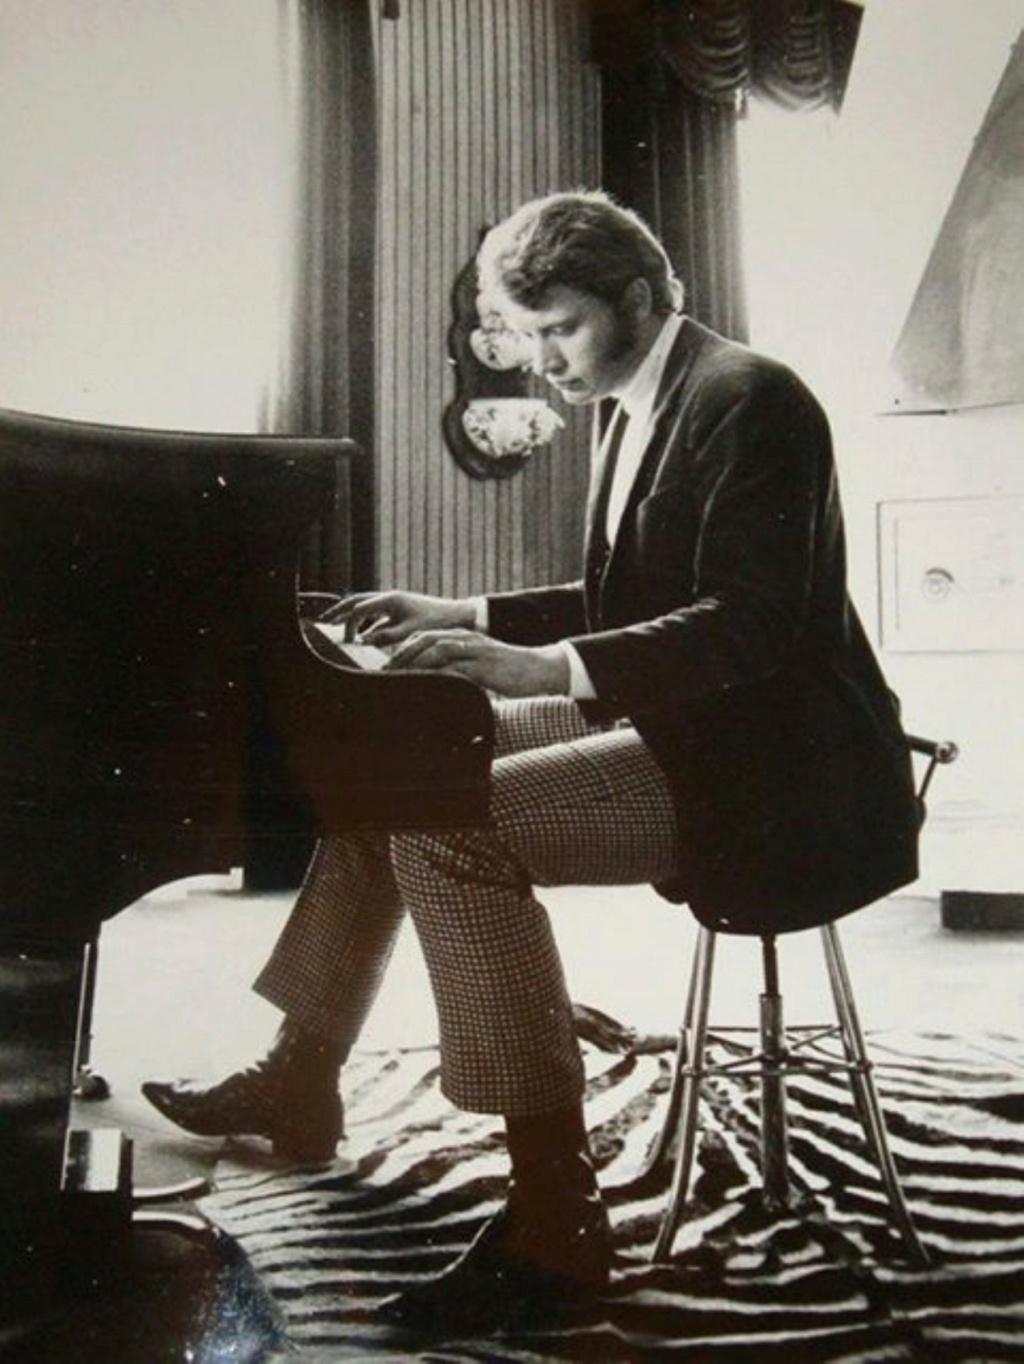 PROPRIETE OU A RESIDE JOHNNY HALLYDAY ( 3/10 ) 'NEUILLY SUR SEINE' ( 1965 ) 2111